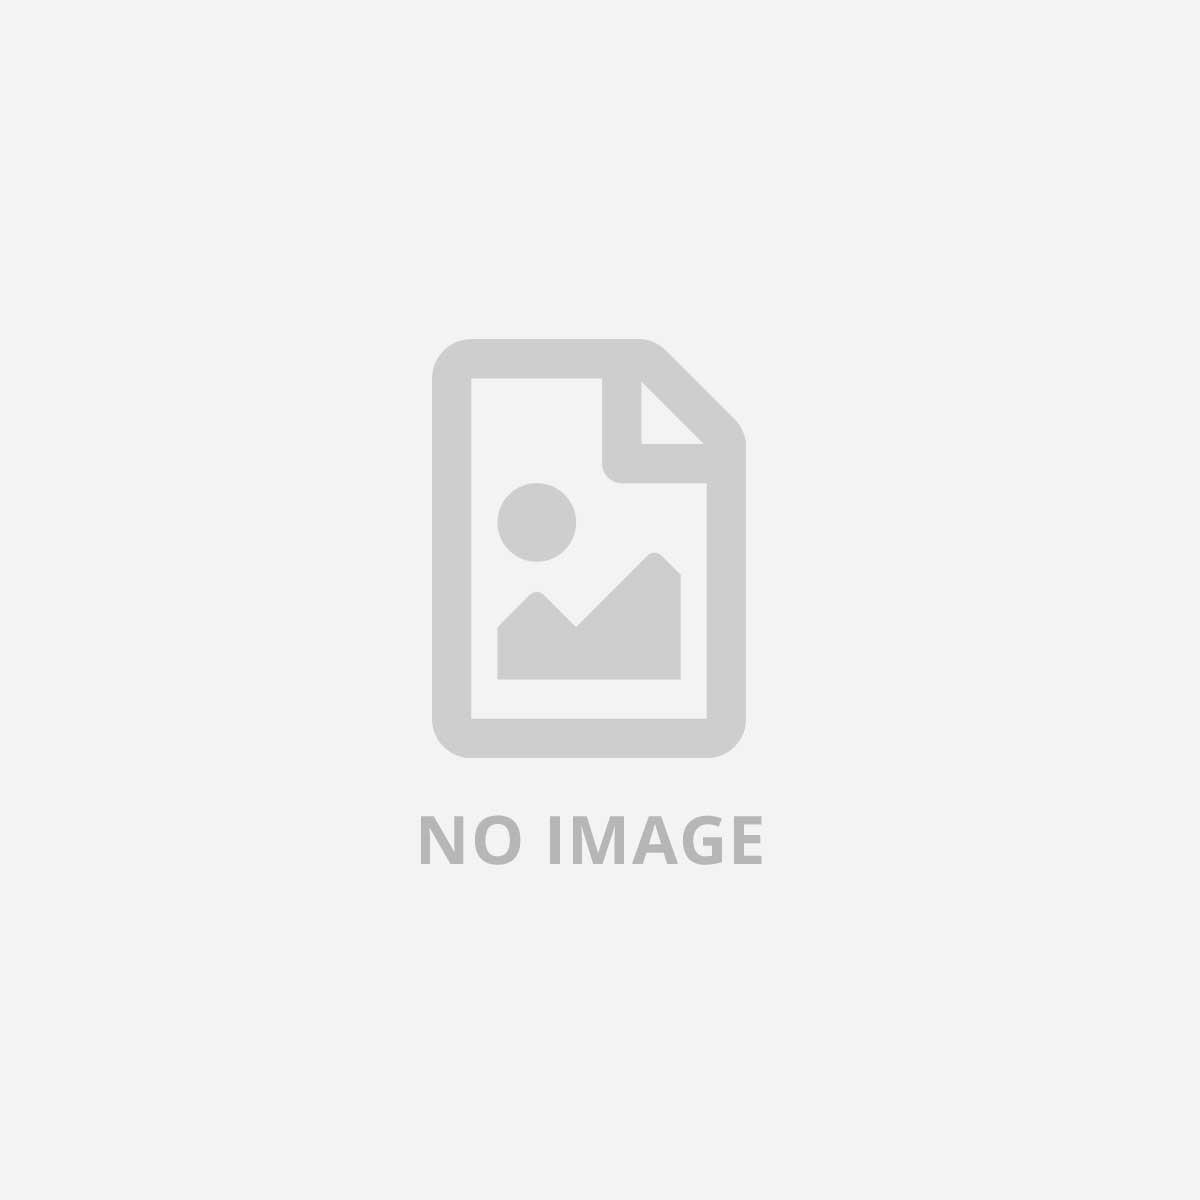 BLASETTI RICAMBI A5 RIGHE 1R 40FF